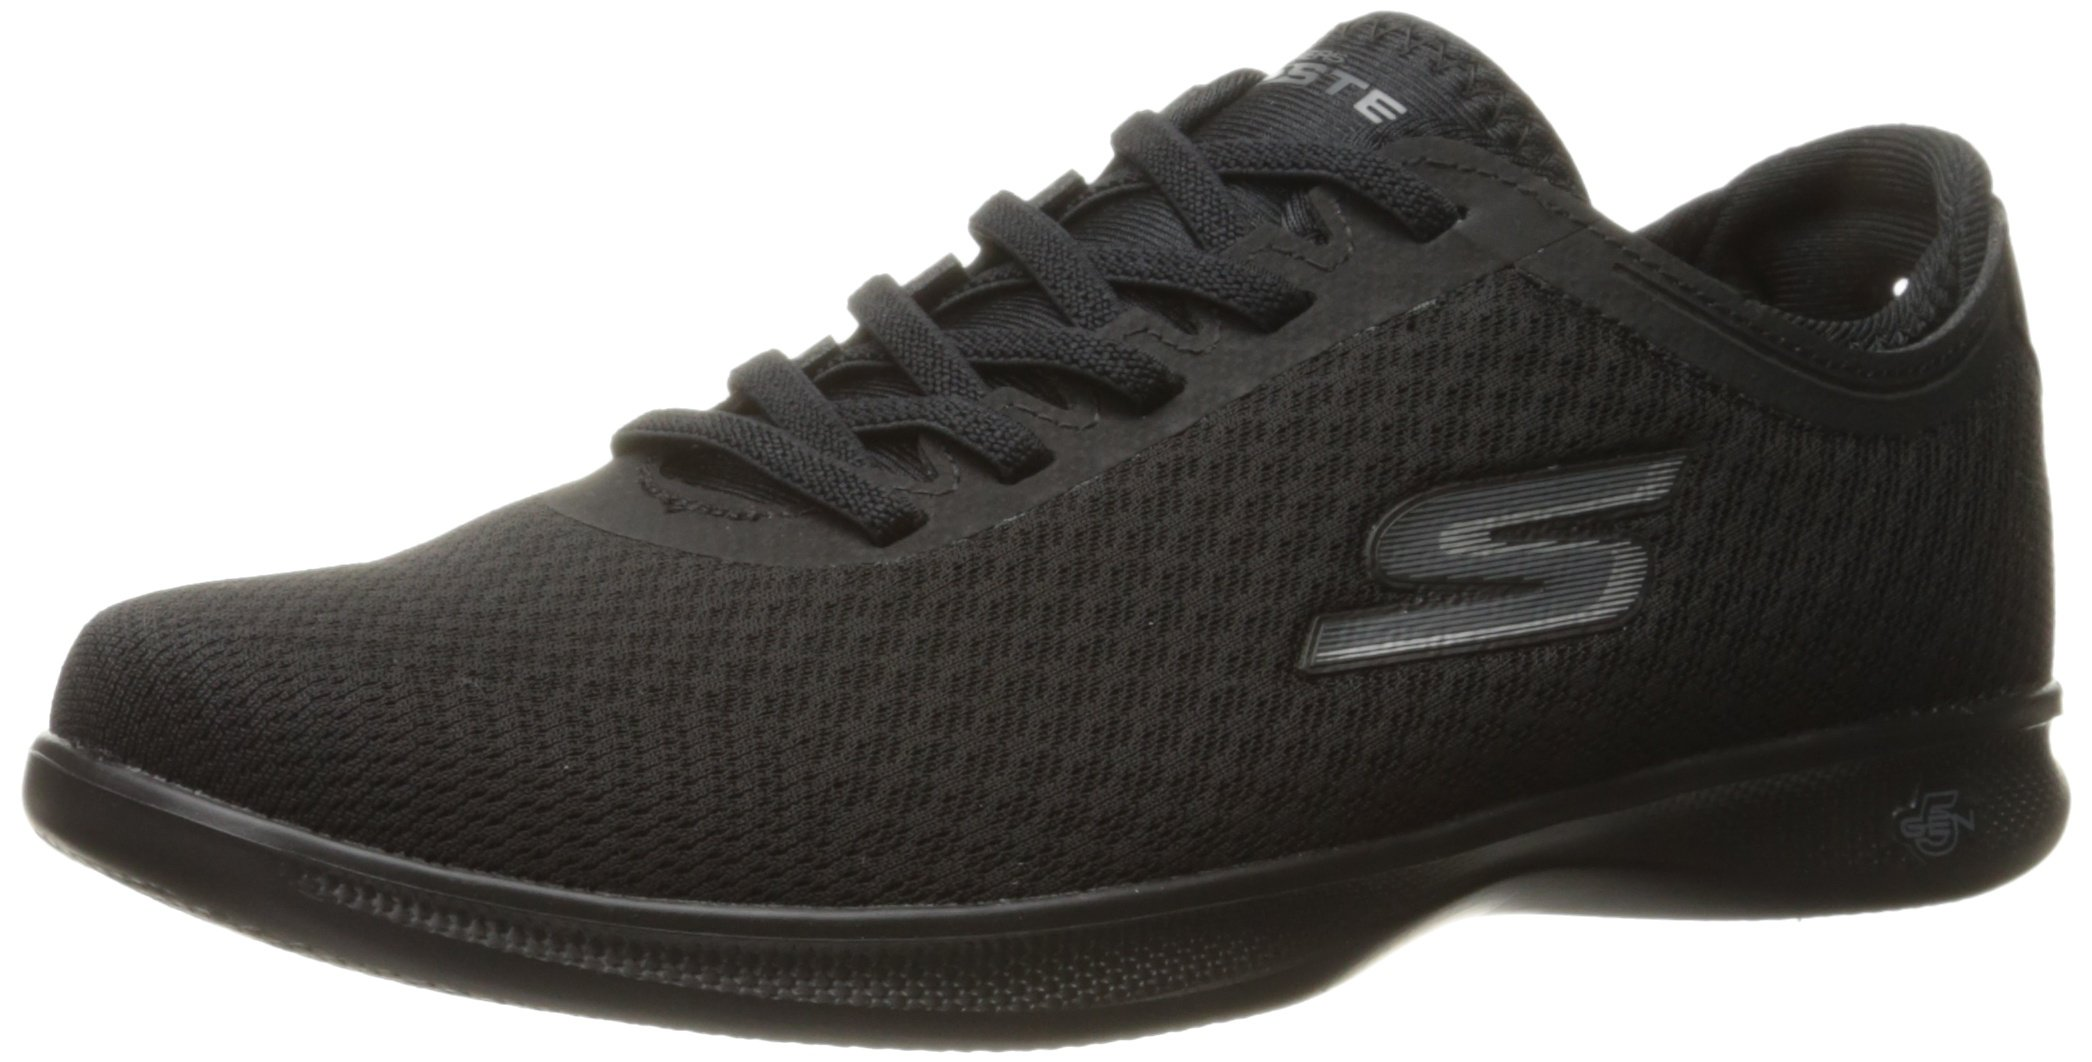 Skechers Performance Women's Go Step Lite-Dashing Walking Shoe, Black Mesh, 9.5 W US